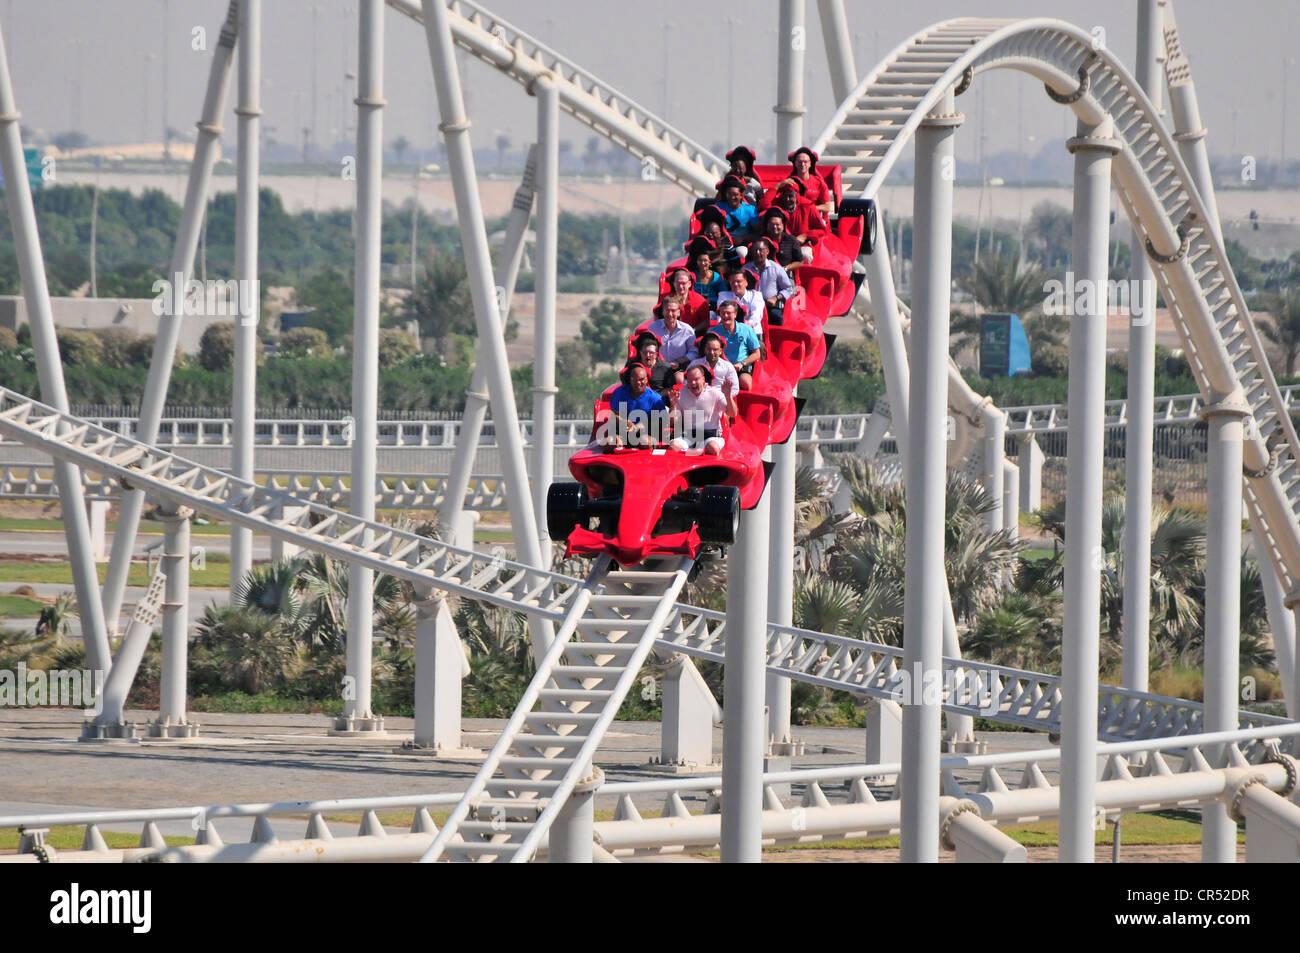 The fastest roller coaster in the world at 240 mph, Ferrari